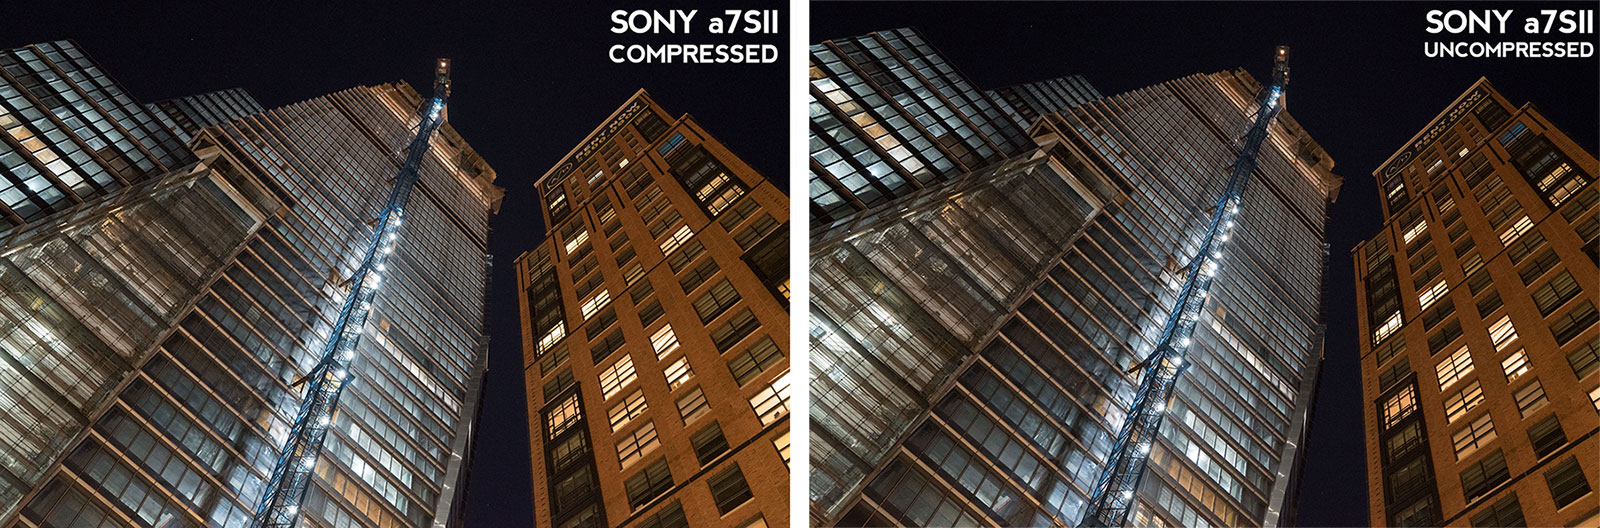 Sony a7SII compressed uncompressed raw